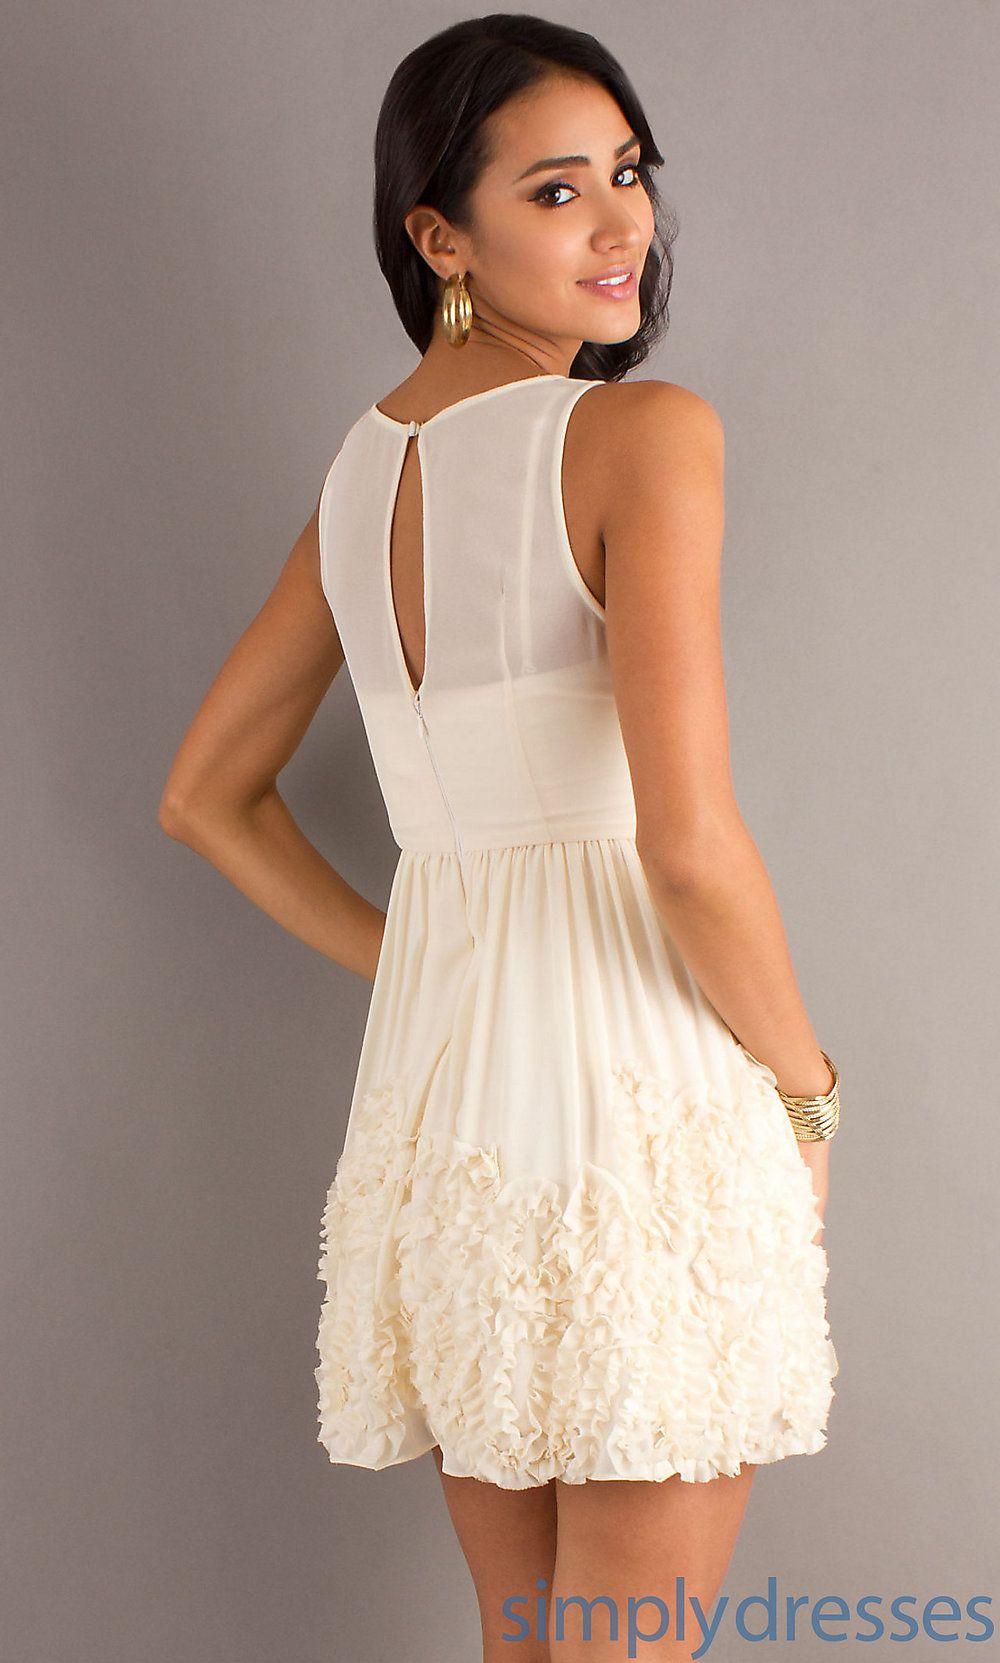 High neck short dress short graduation dresses simply dresses